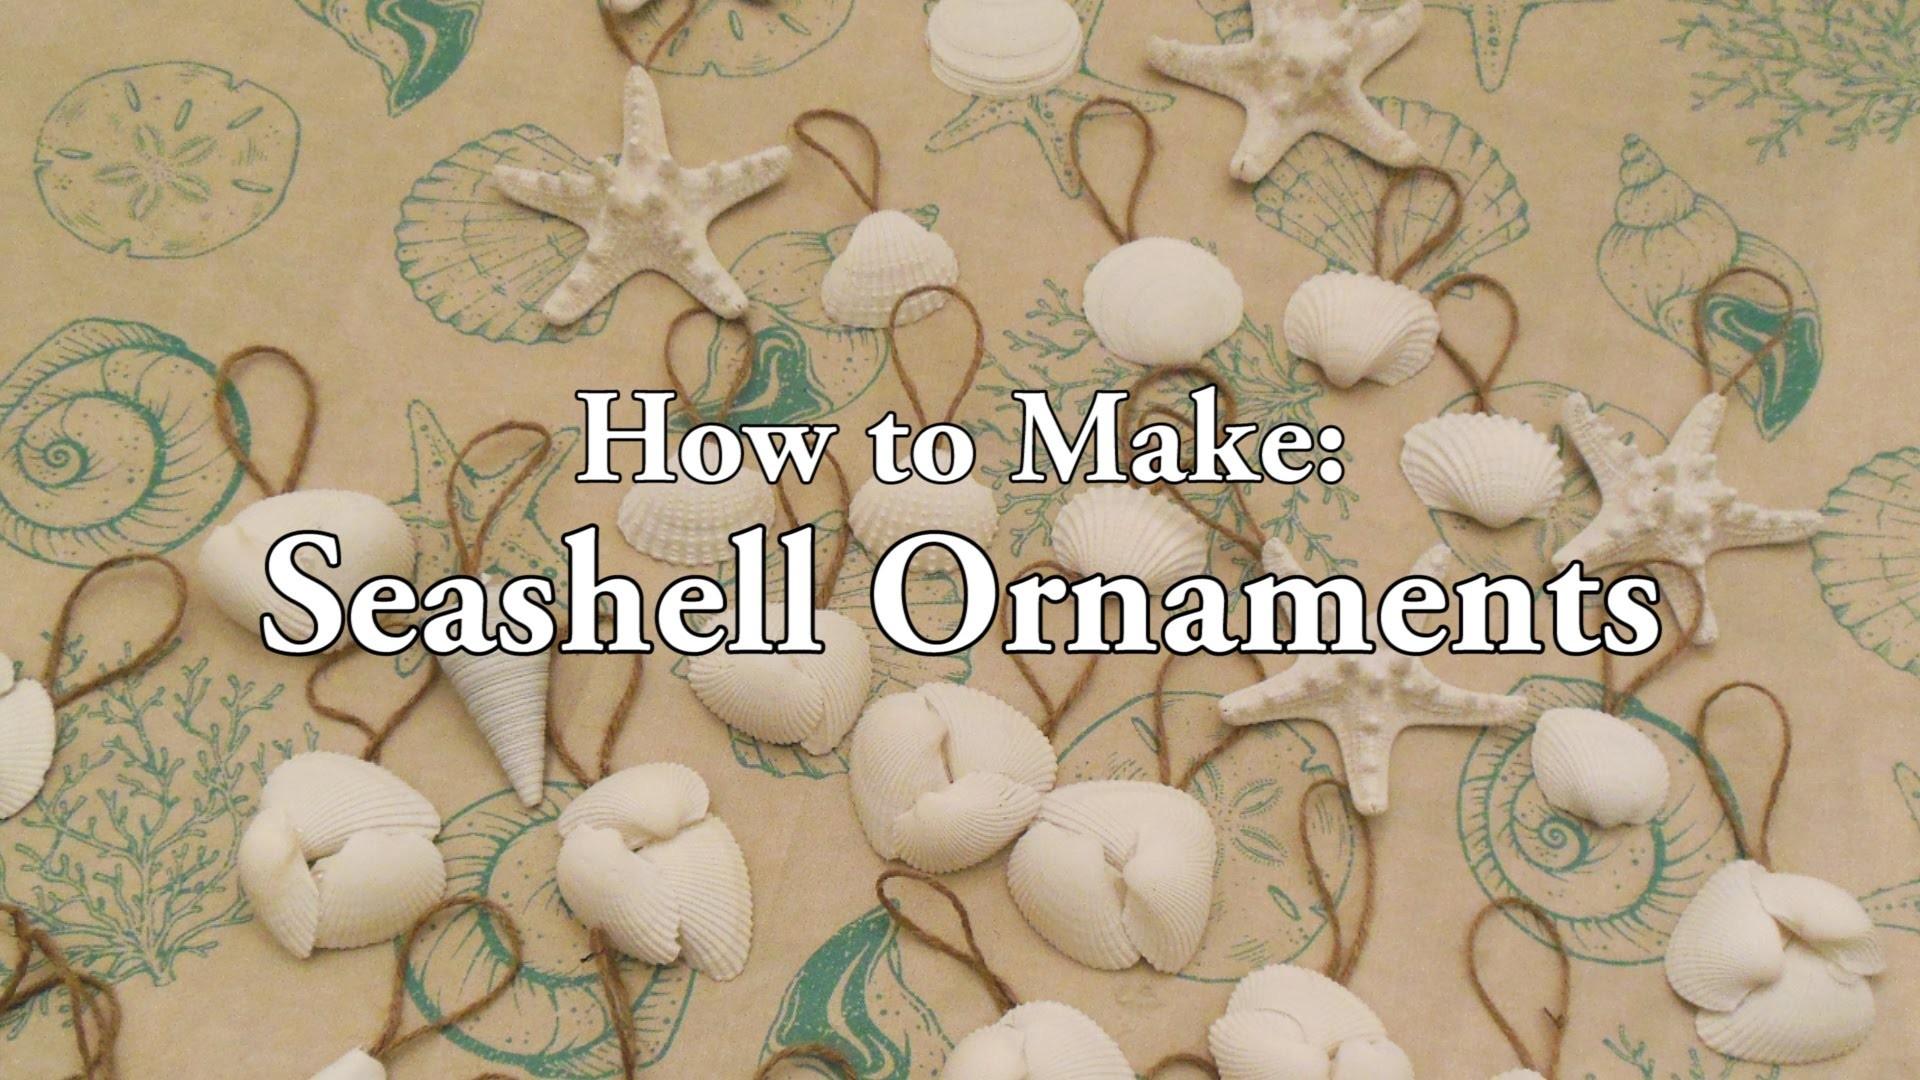 How to Make: Seashell Ornaments